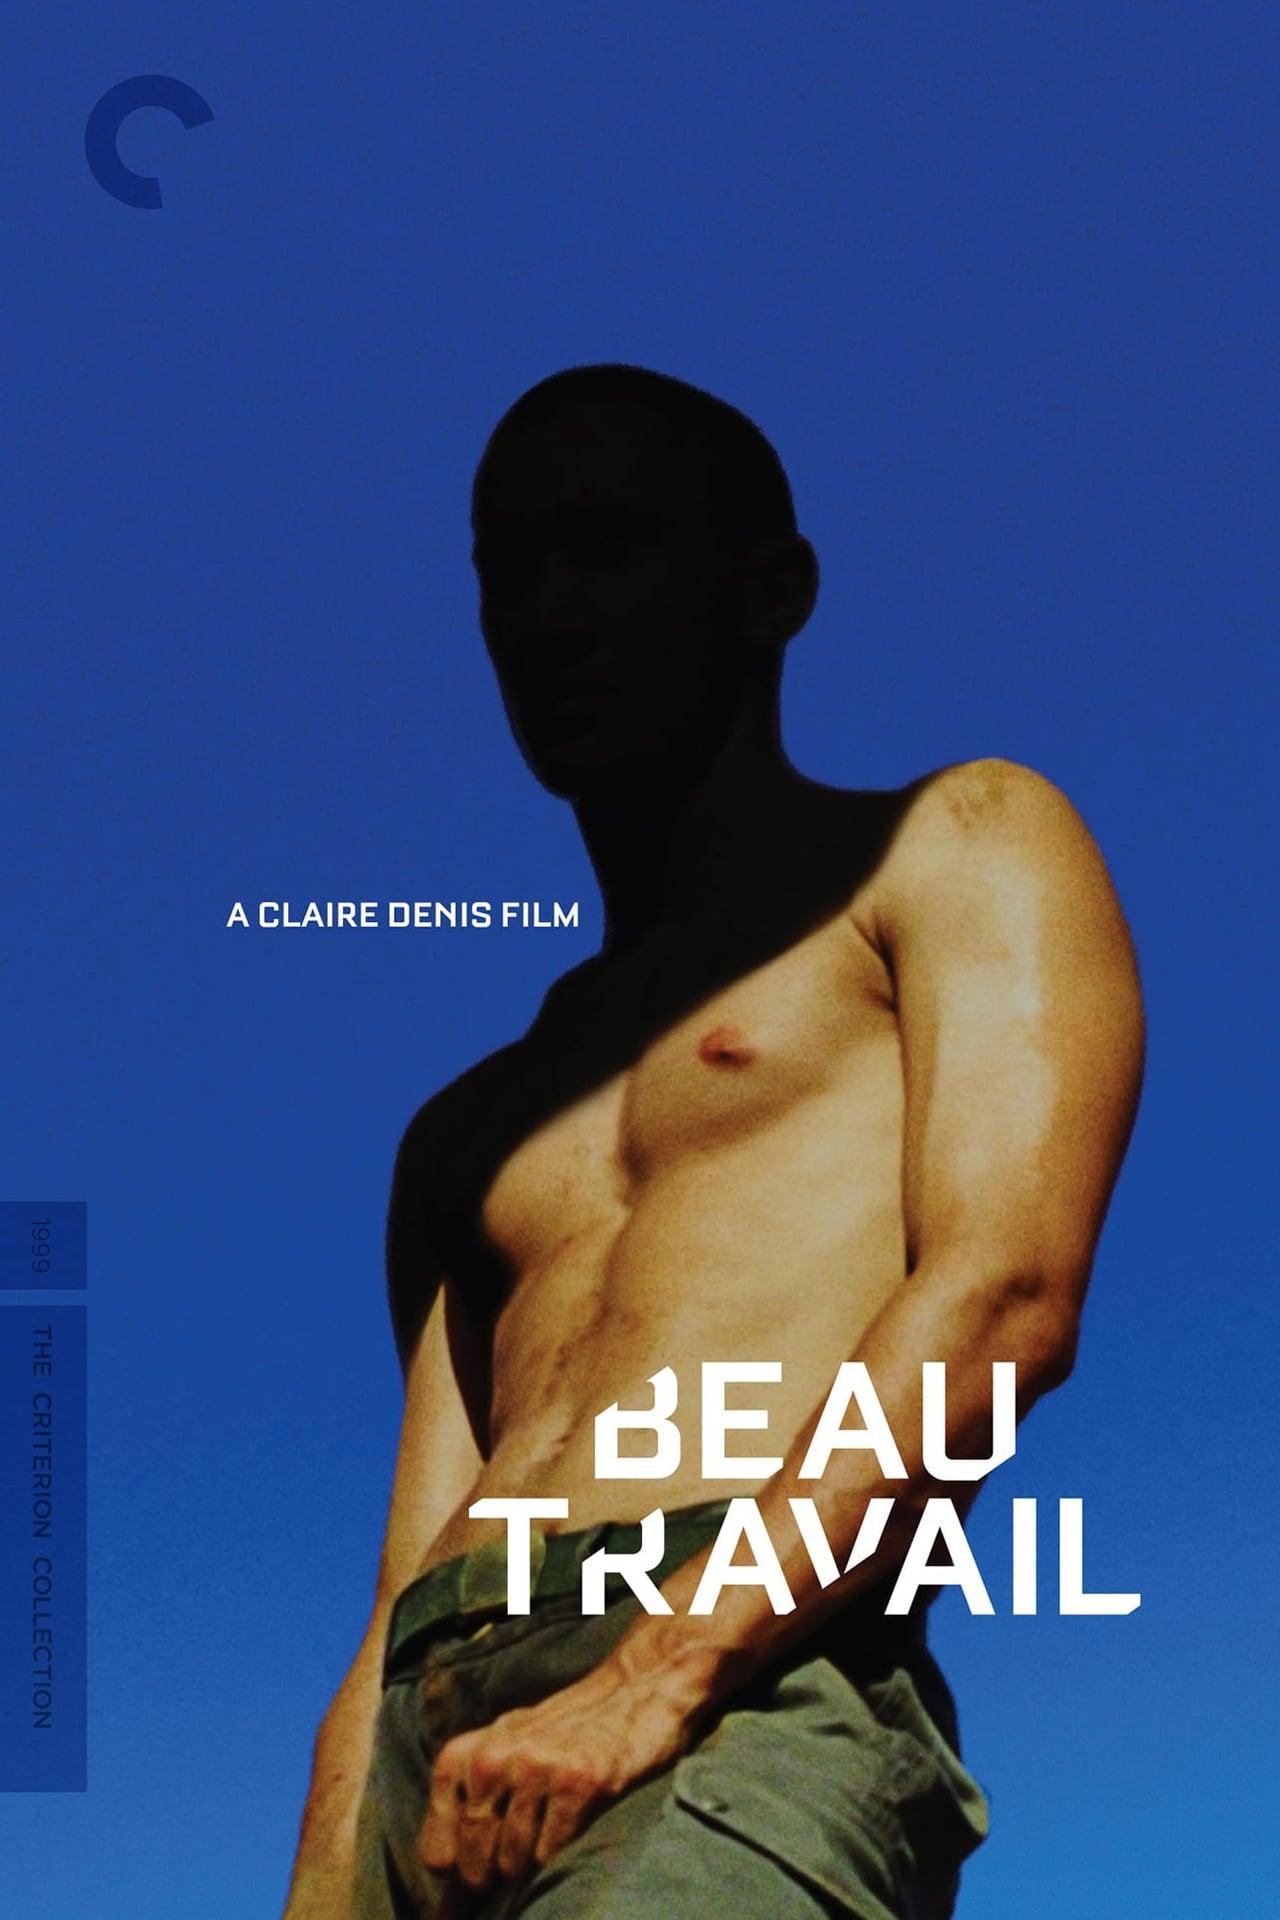 Beau travail (1999) - IMDb